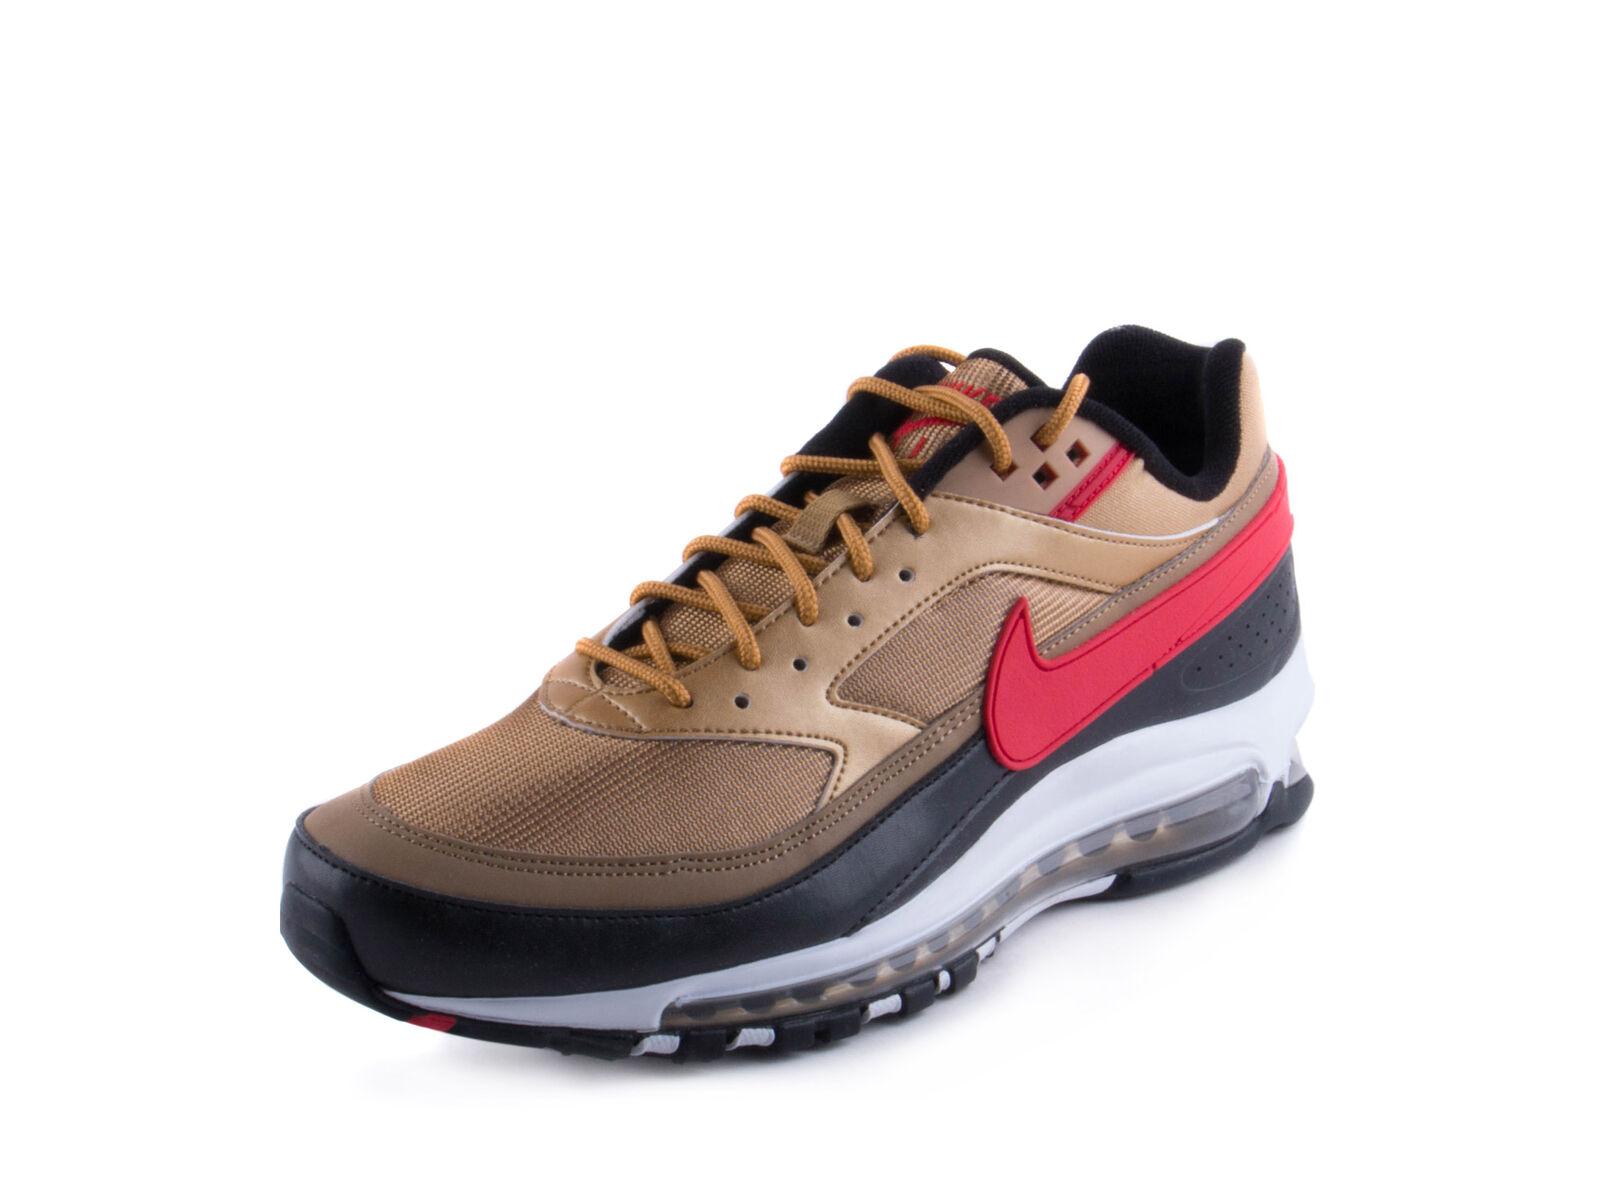 d17812f55c Nike Mens Air 97 BW gold Red AO2406-700 Max Metallic nnxlun7318 ...